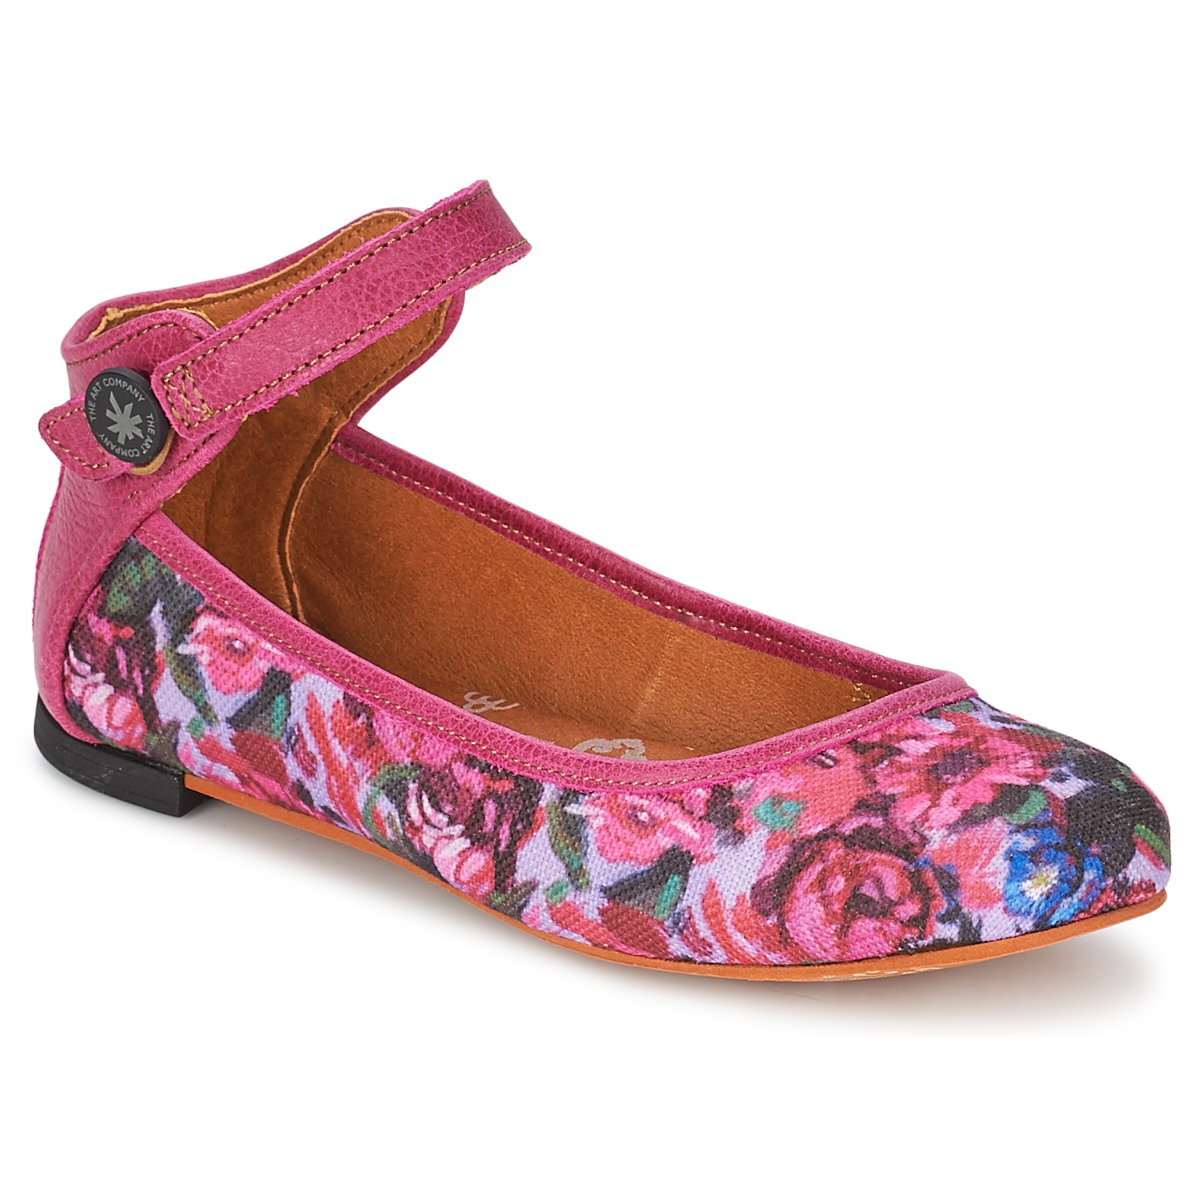 Art LILLE Rose - Kostenloser Versand bei Spartoode ! - Schuhe Ballerinas Damen 38,00 €